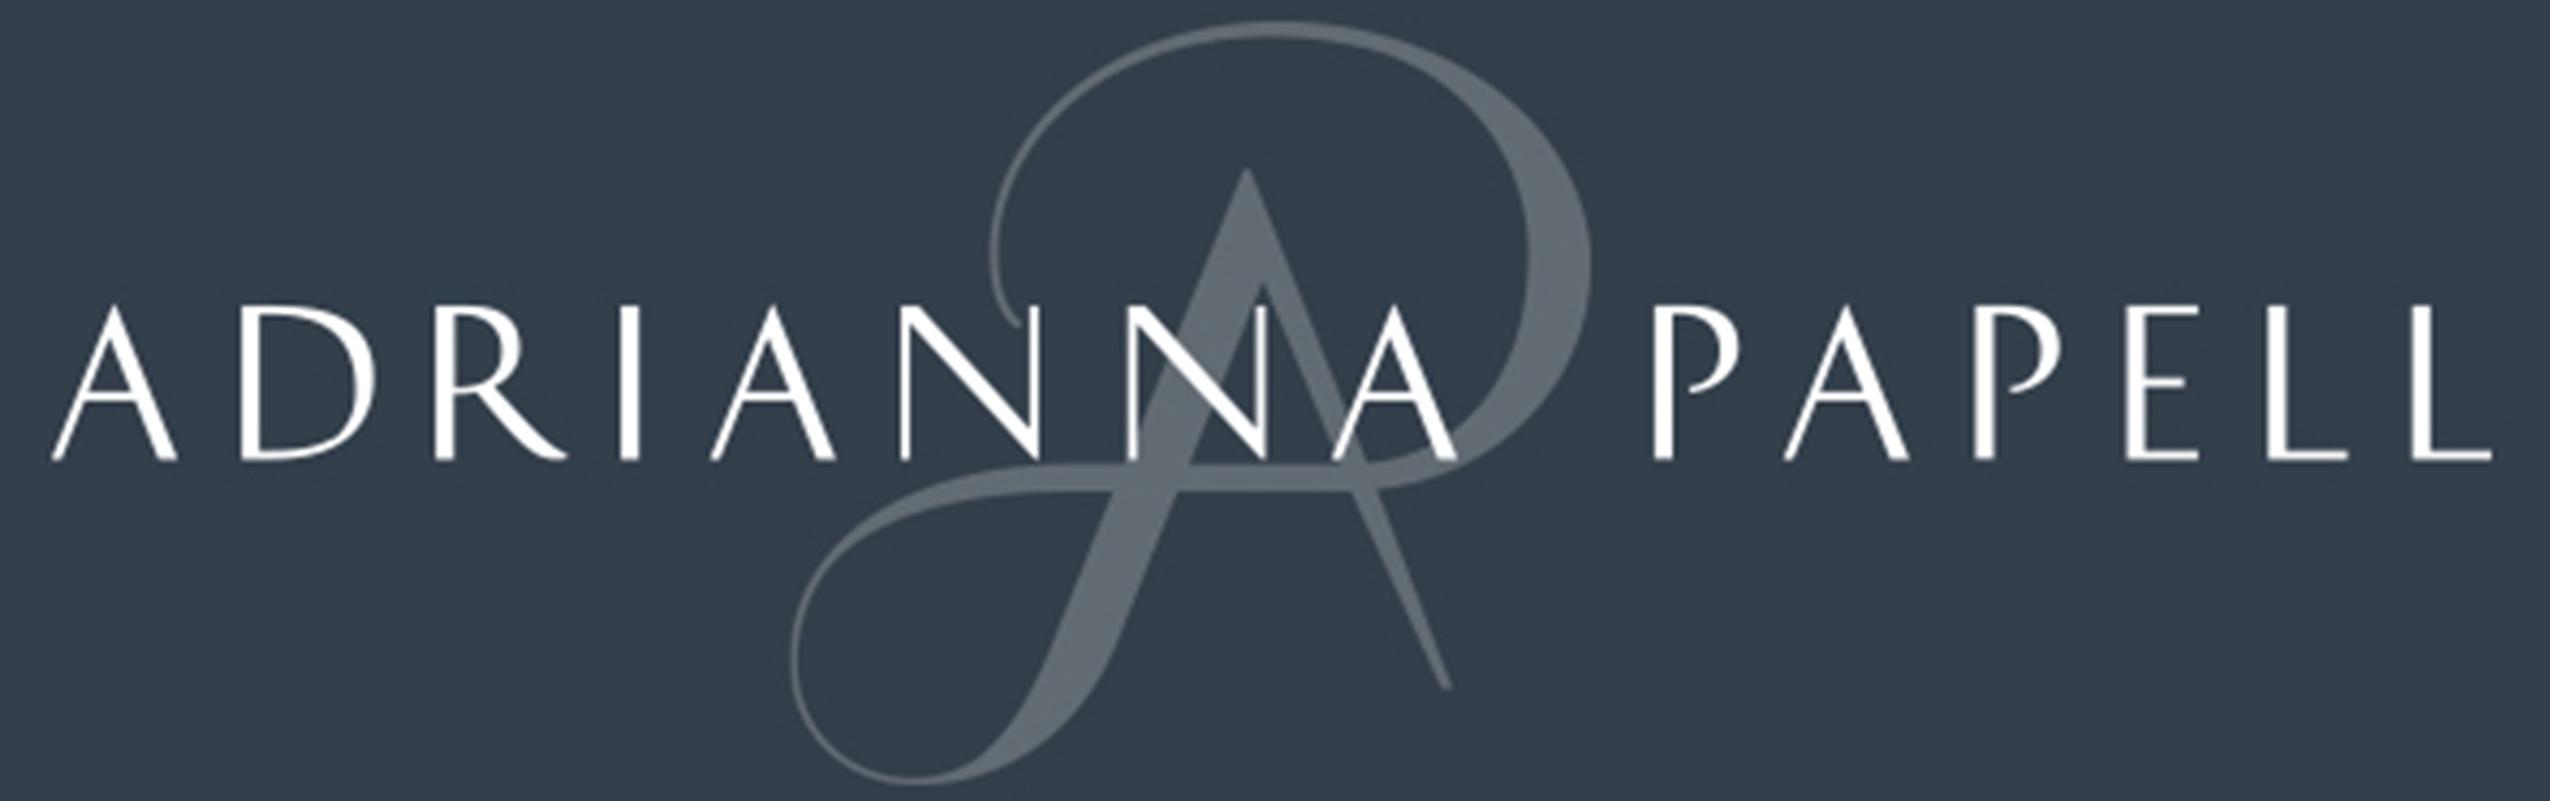 adrianna-papell-logo